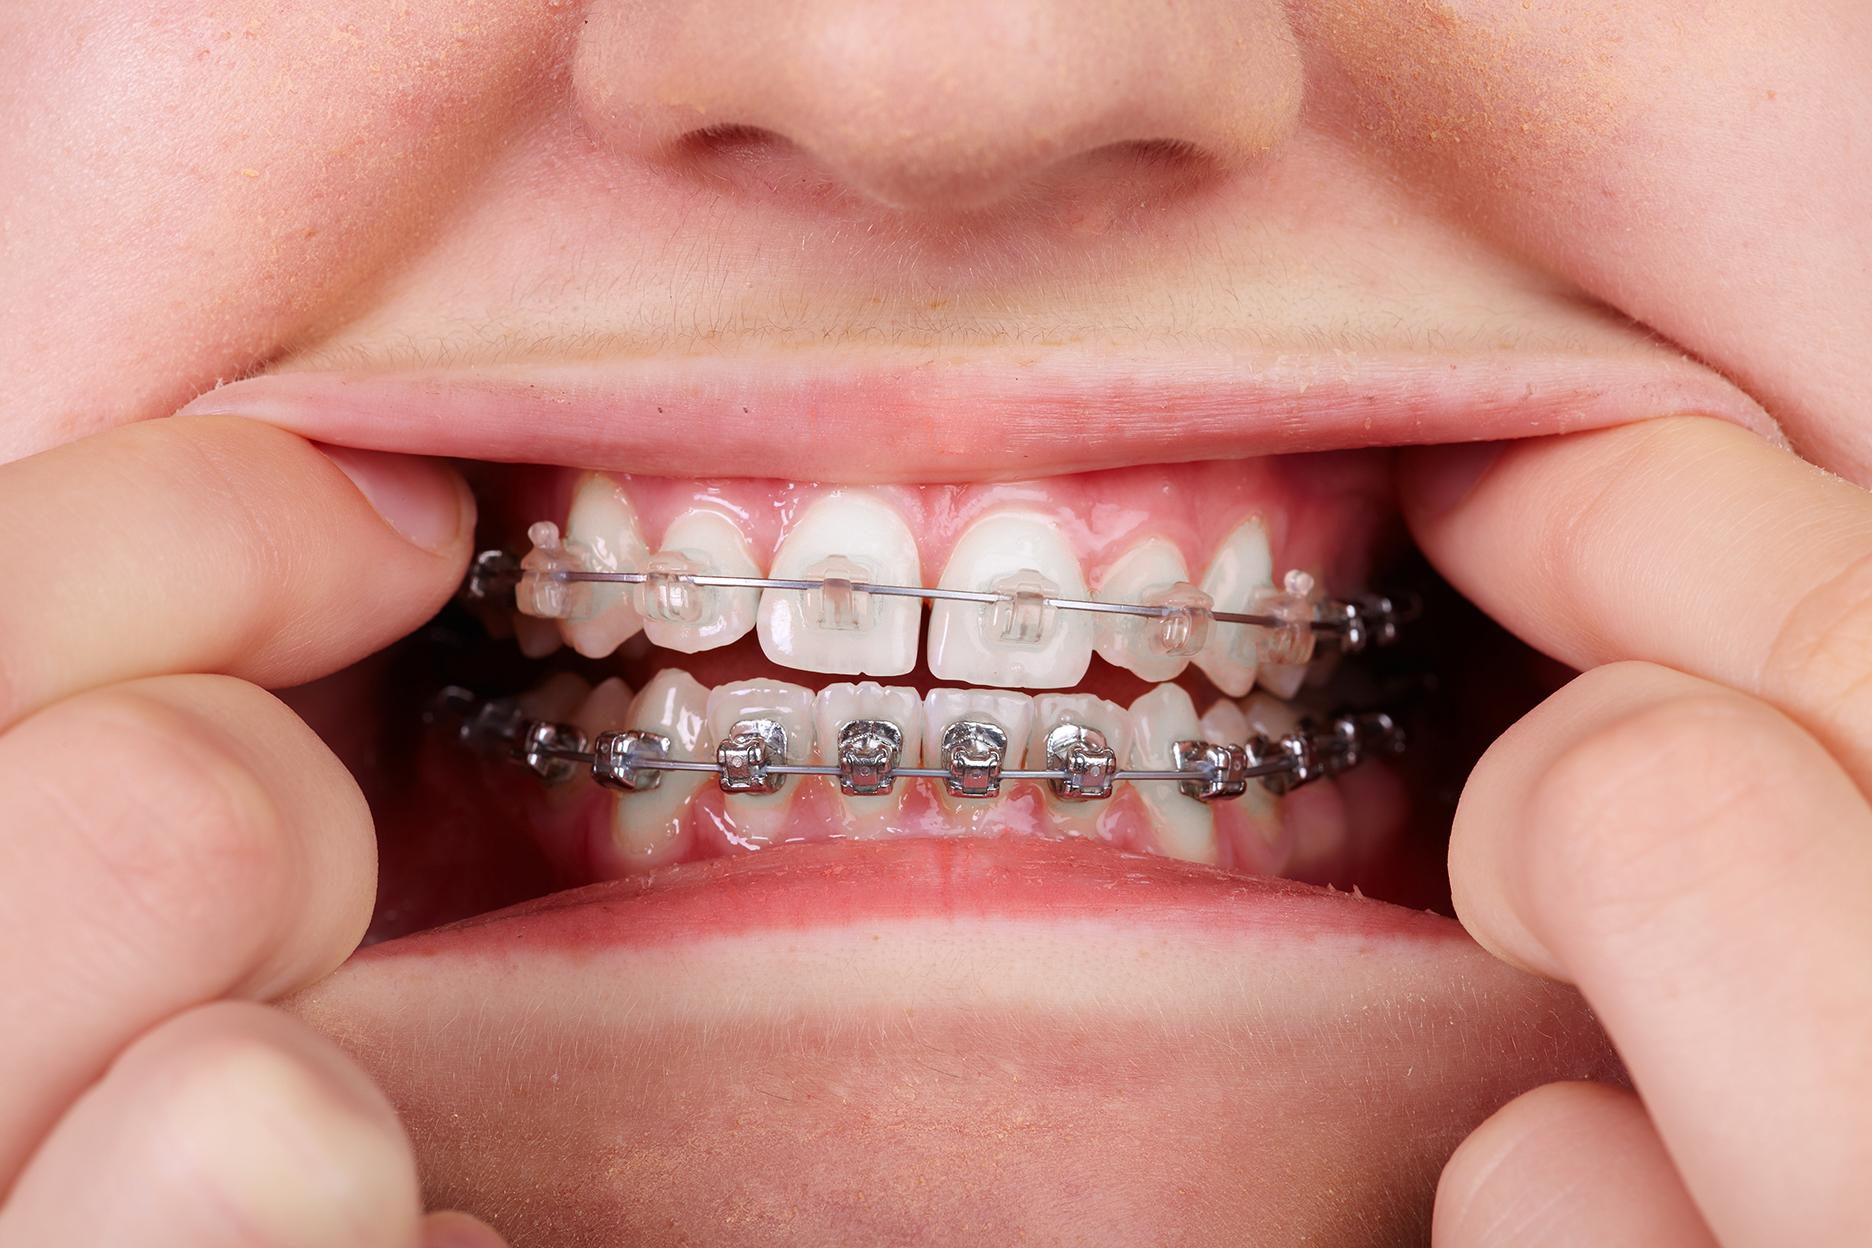 Dentofacial Orthopedics